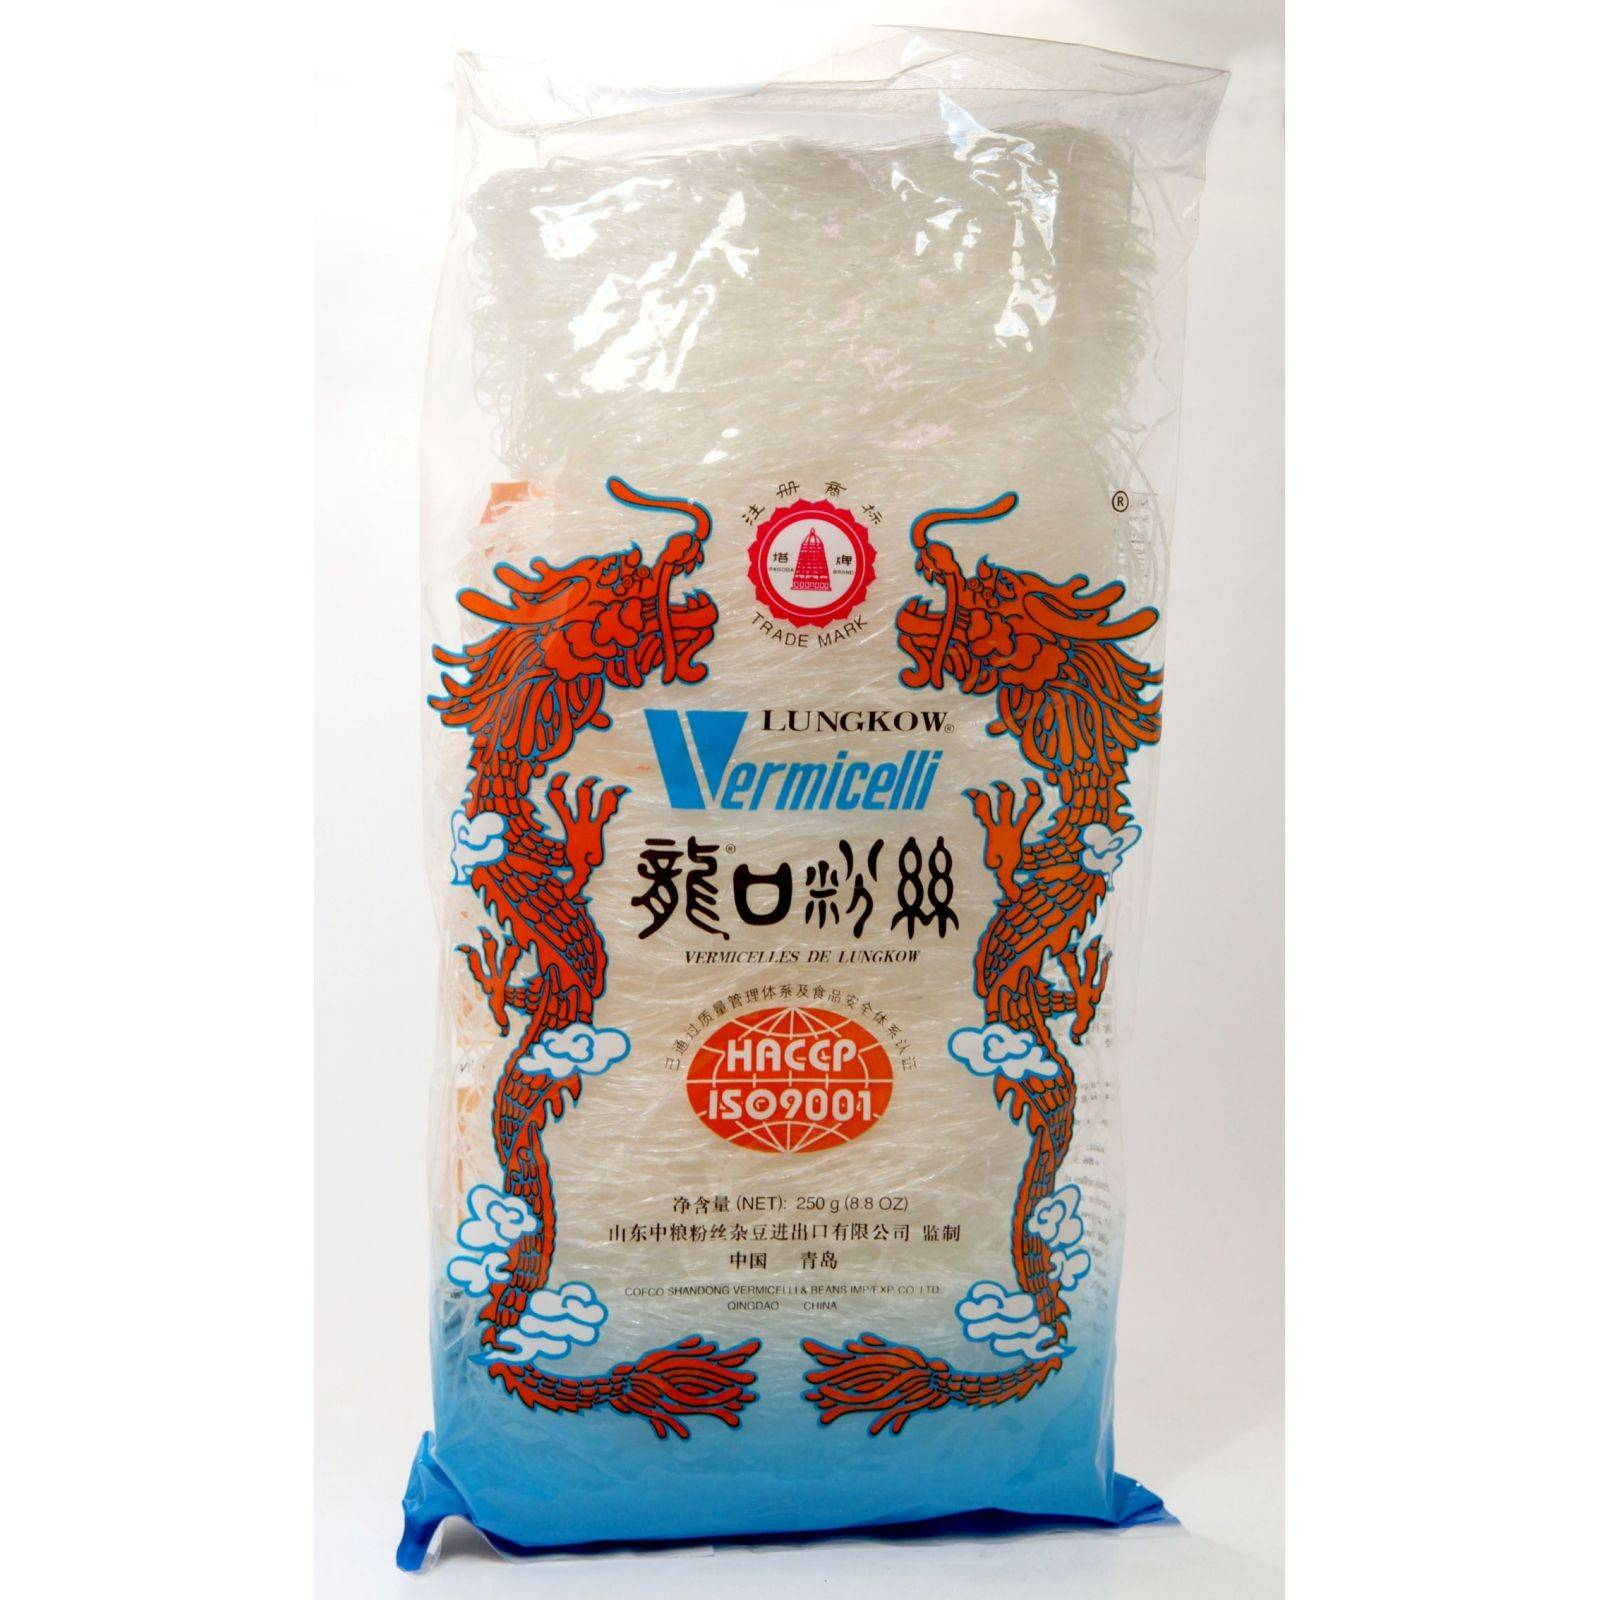 Asia Marché Vermicelles de soja Lungkow 5kg